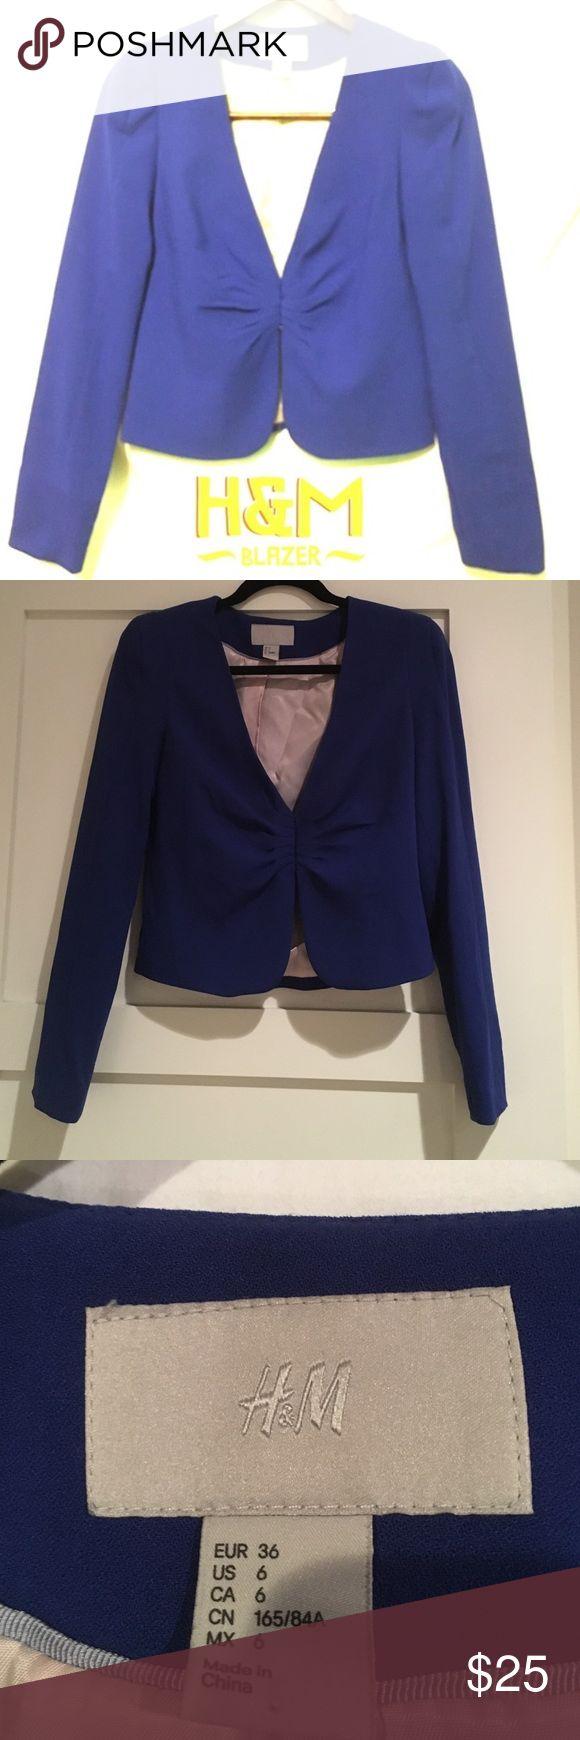 💙 H&M Royal Blue Blazer 💙 💙 H&M Royal Blue Blazer! Shell: 63% polyester 31% viscose 6% elastane. Lining: 52% polyester 48% viscose. Mint condition! 💙 H&M Jackets & Coats Blazers